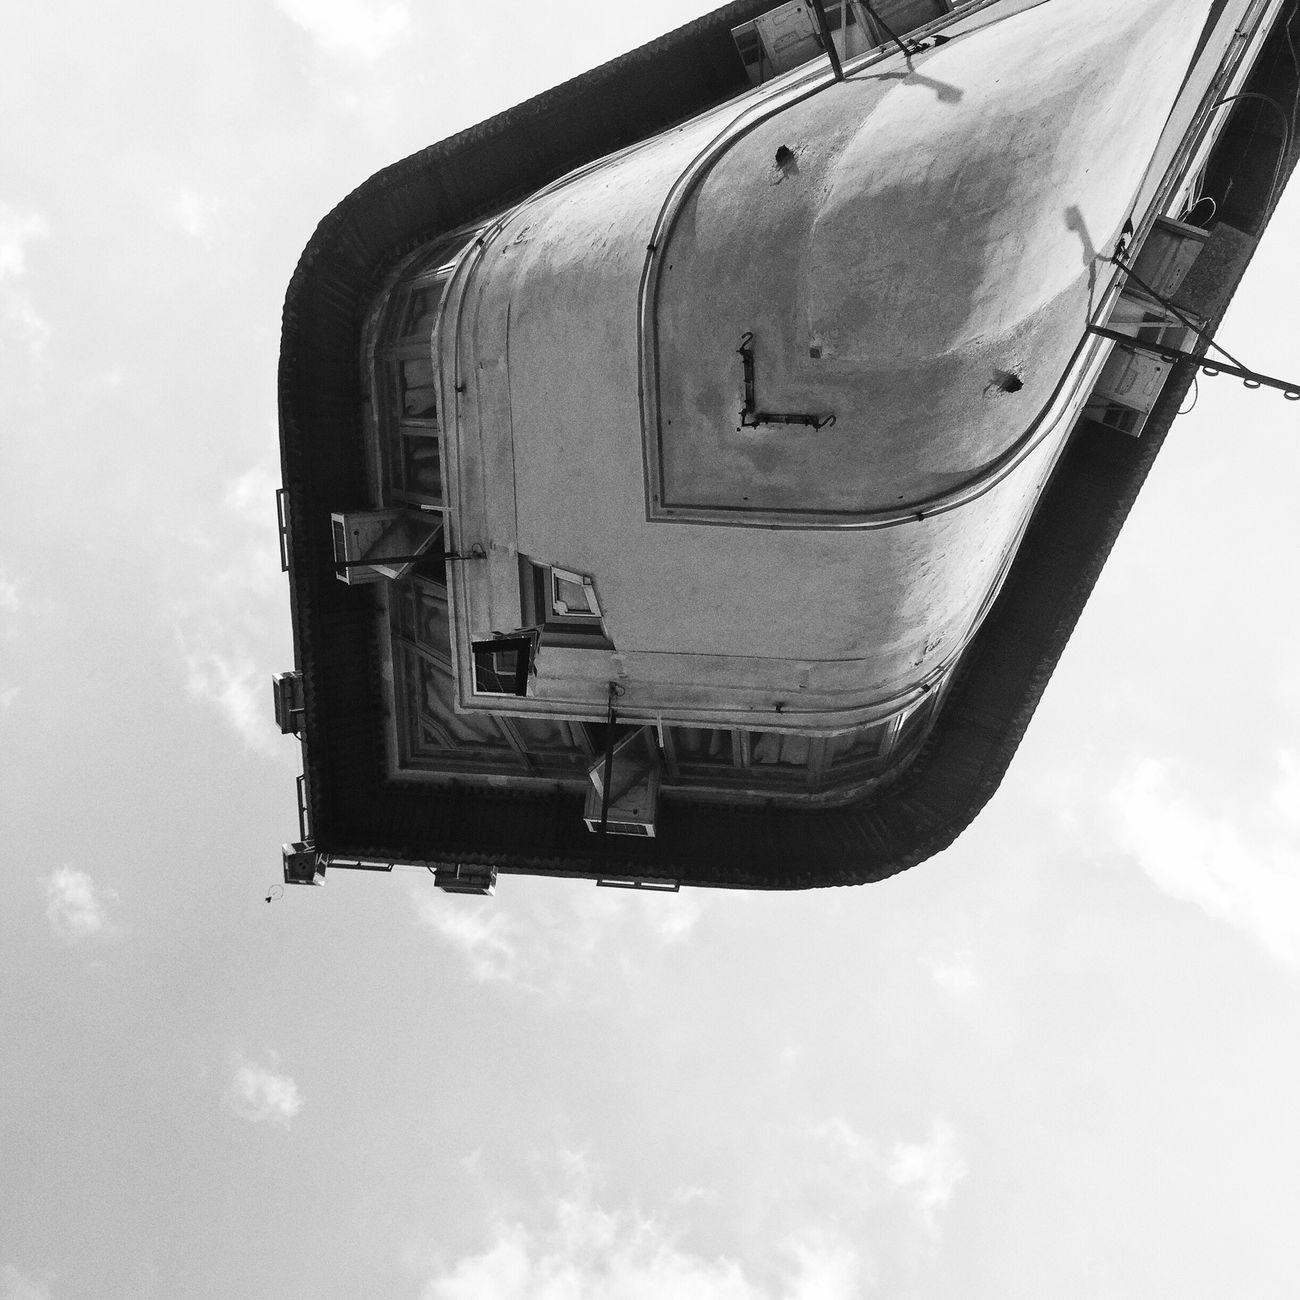 One up Symmetryporn Symmetrical Symmetry Artistic Abstract Art Art Abstract Abstractart Doubleexposure Double Exposure Black & White Black And White Blackandwhite Blackandwhite Photography EyeEm Best Shots - Black + White Monochrome Monochromatic Rearchitseries Abstractarchitecture